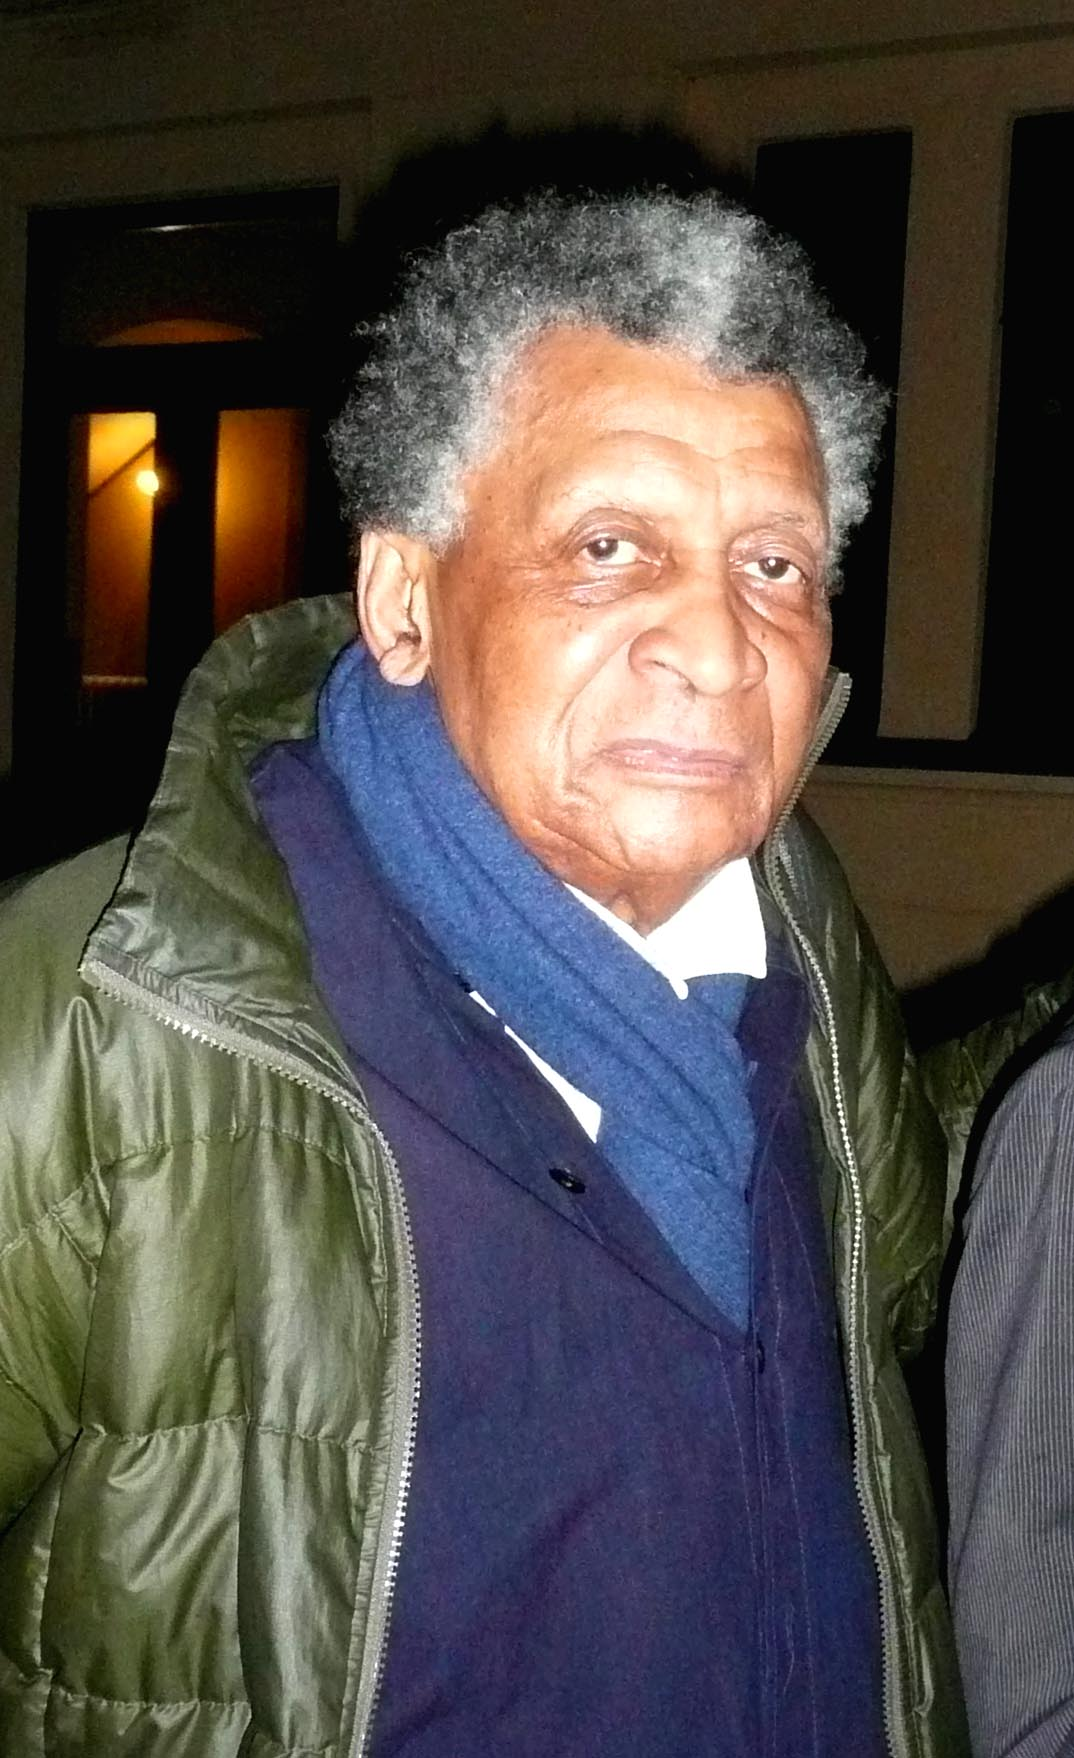 AbdullahIbrahim JanOlsson